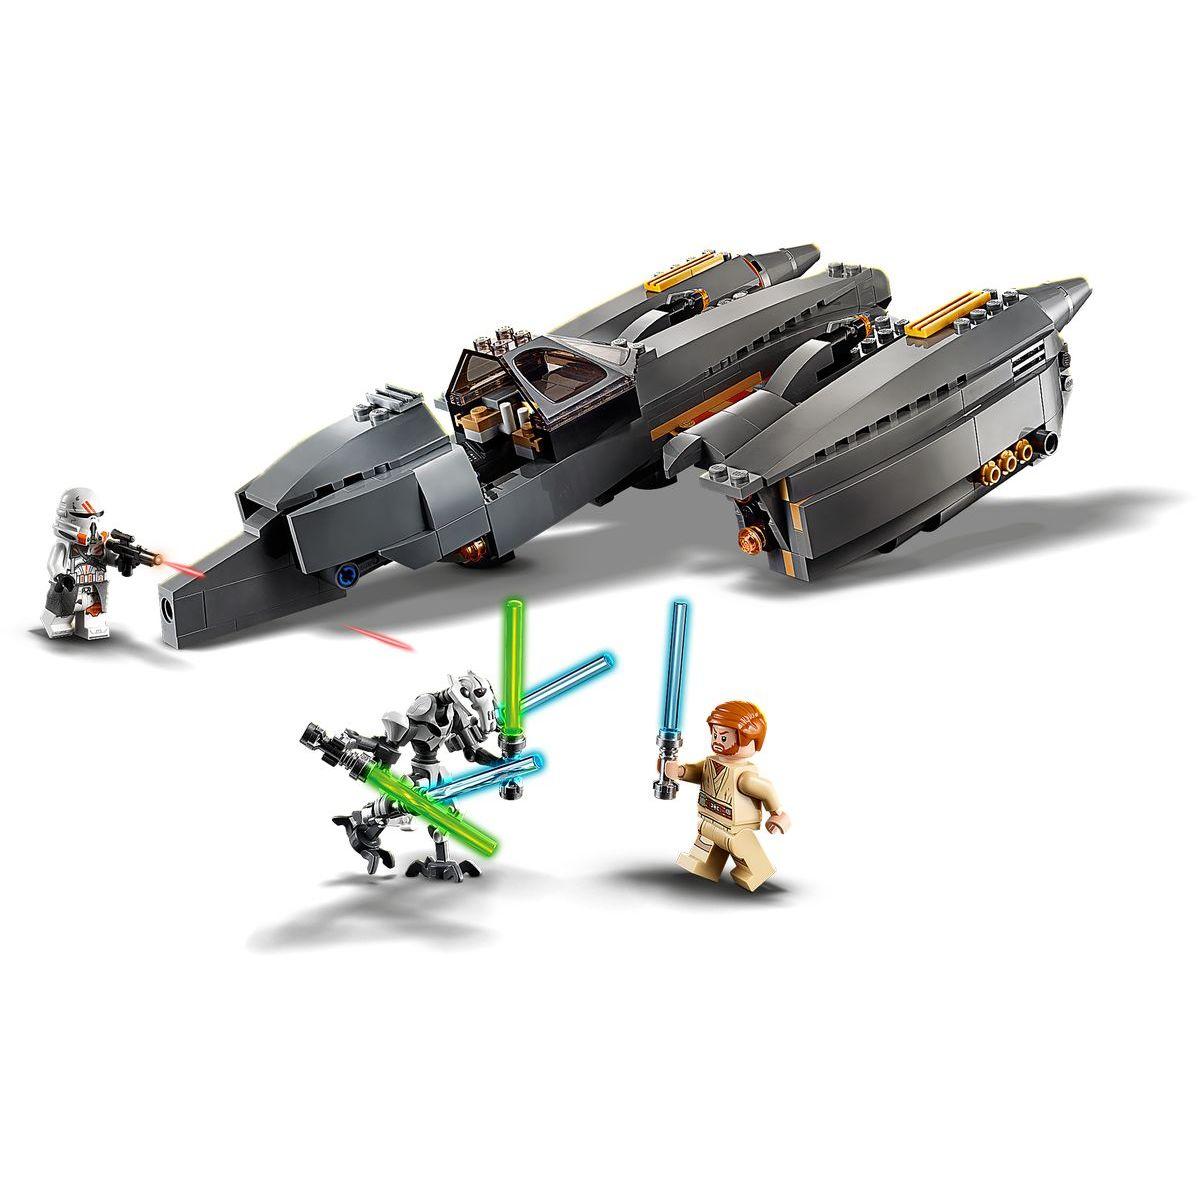 LEGO Star Wars ™ 75286 Stíhačka generála Grievouse